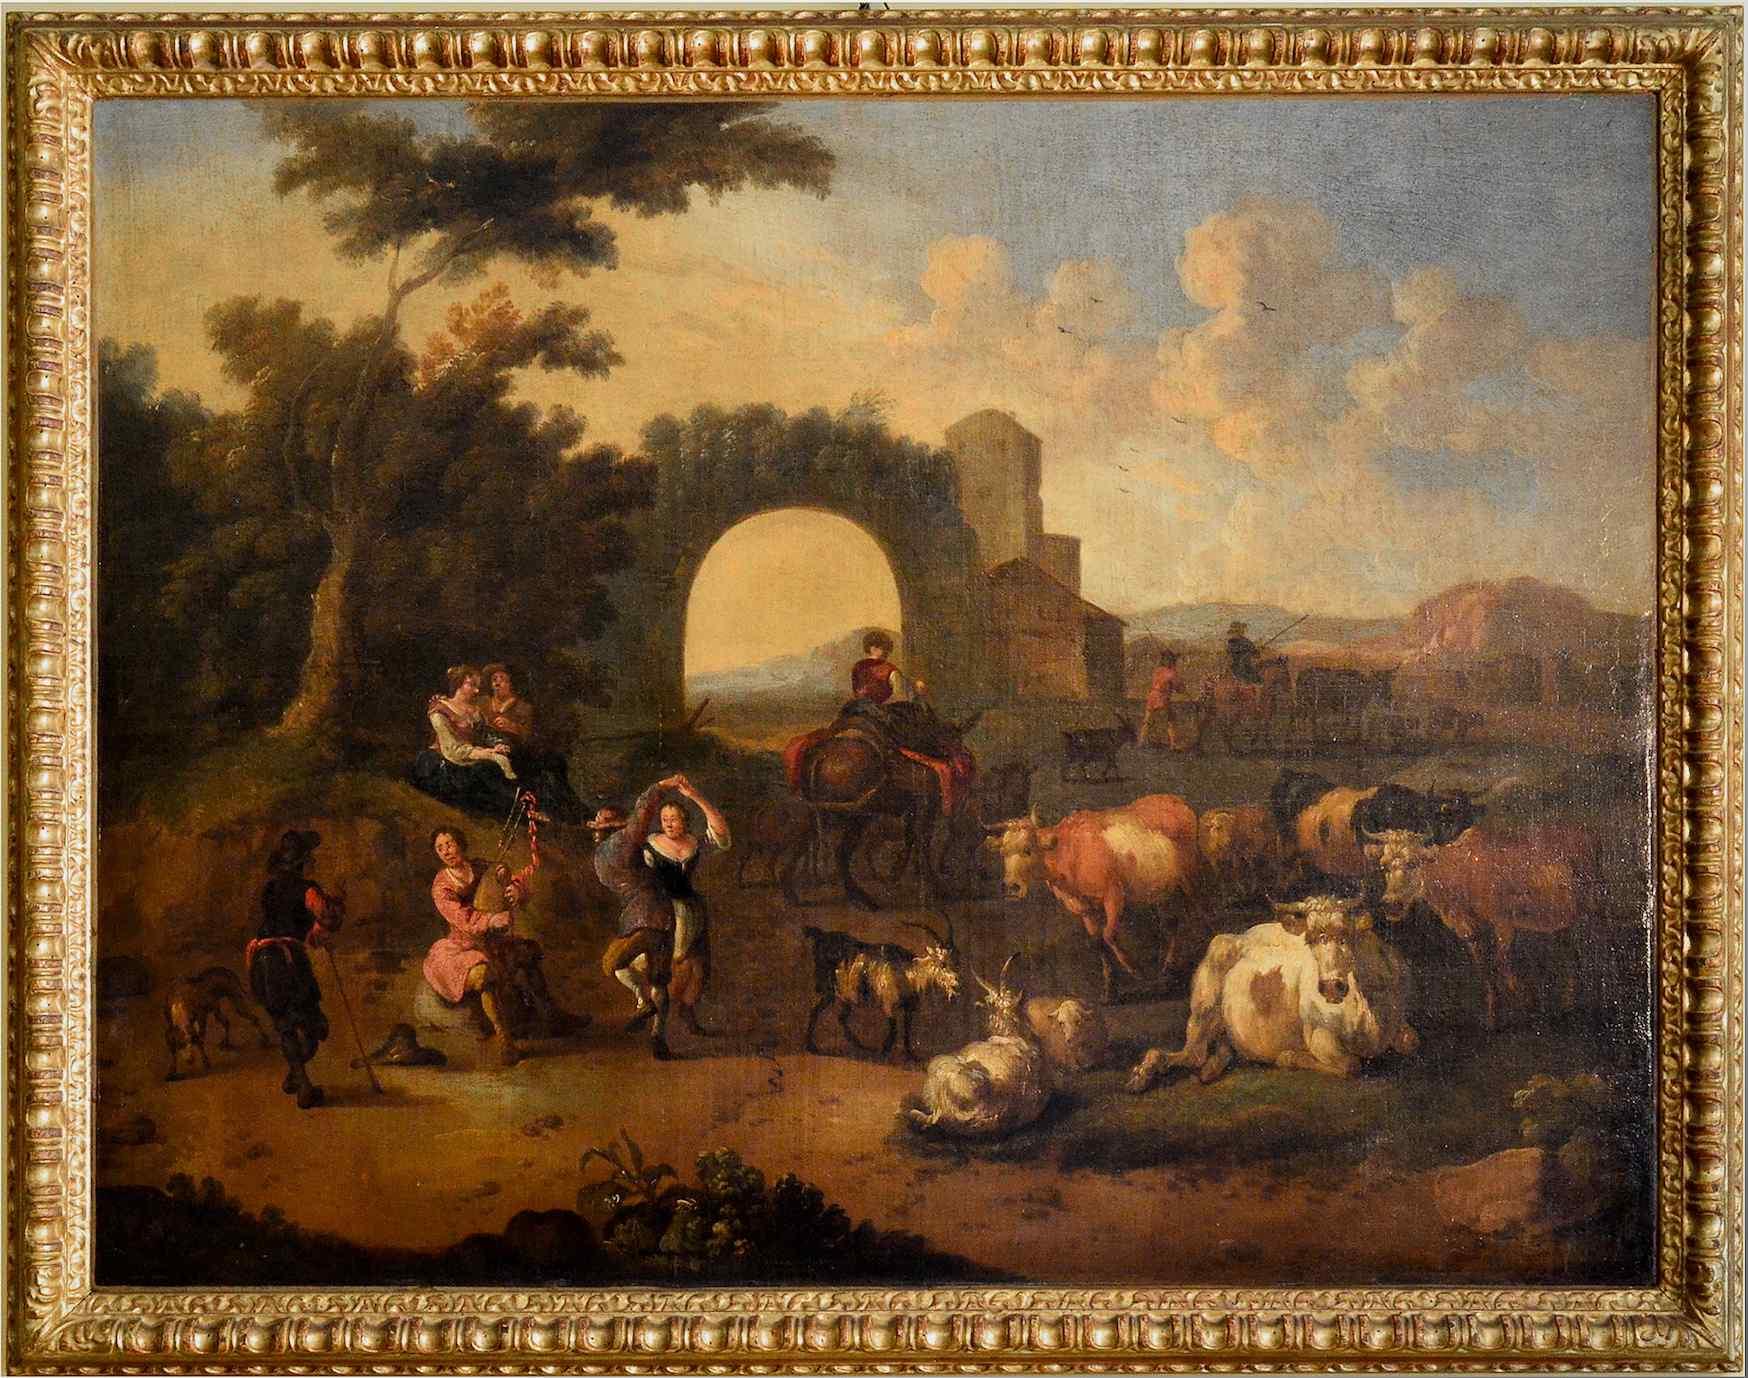 Michelangelo Cerquozzi (1602 - 1660) bottega, Festa rurale